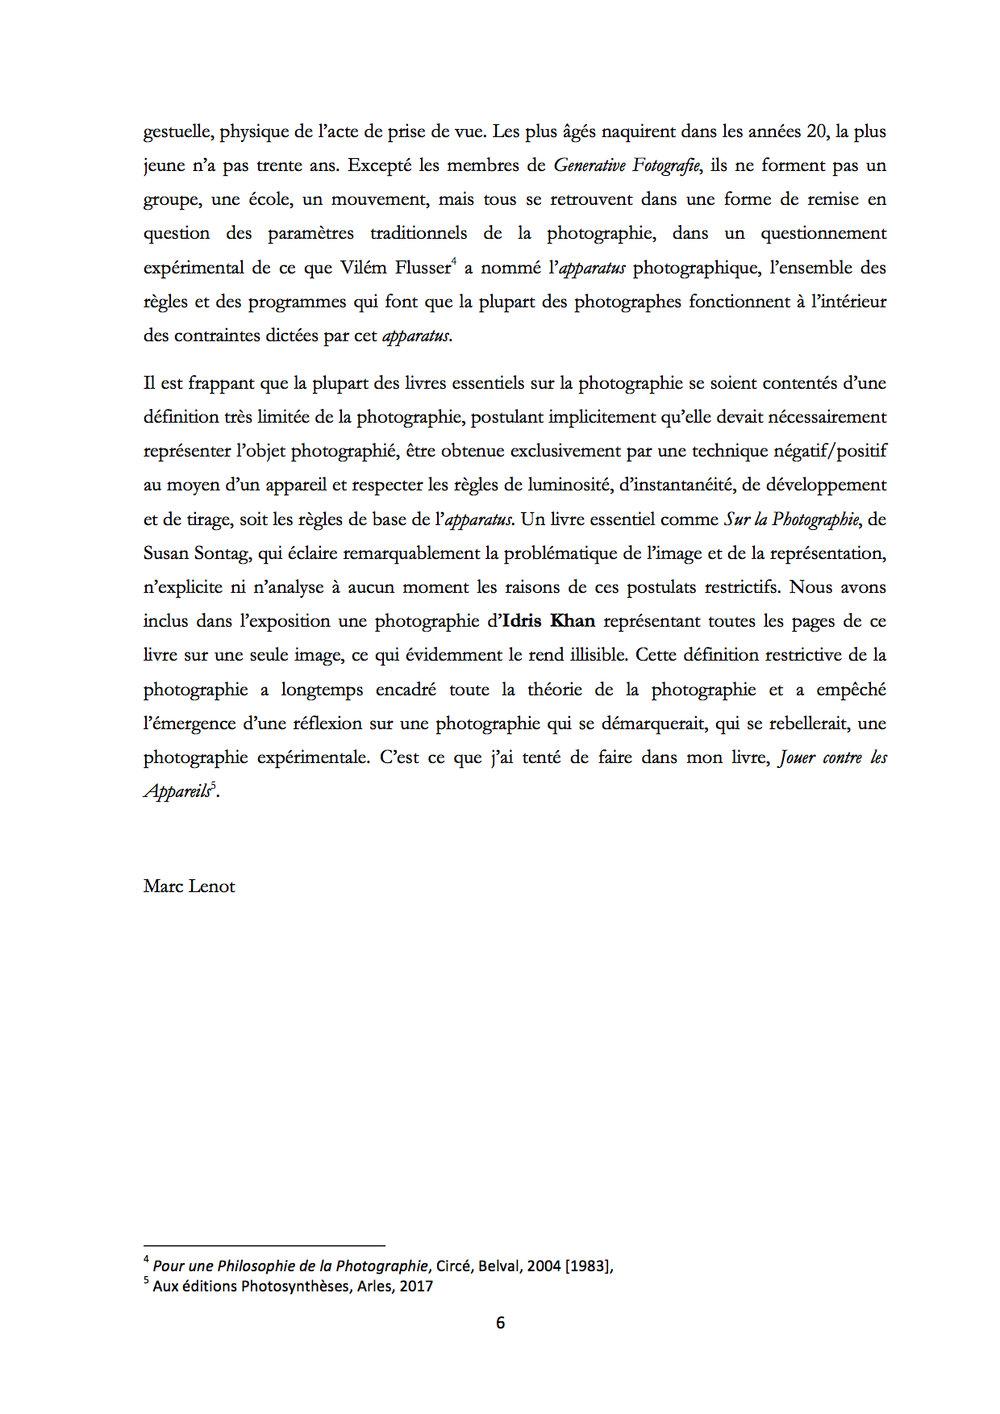 MARC LENOT text6.jpg